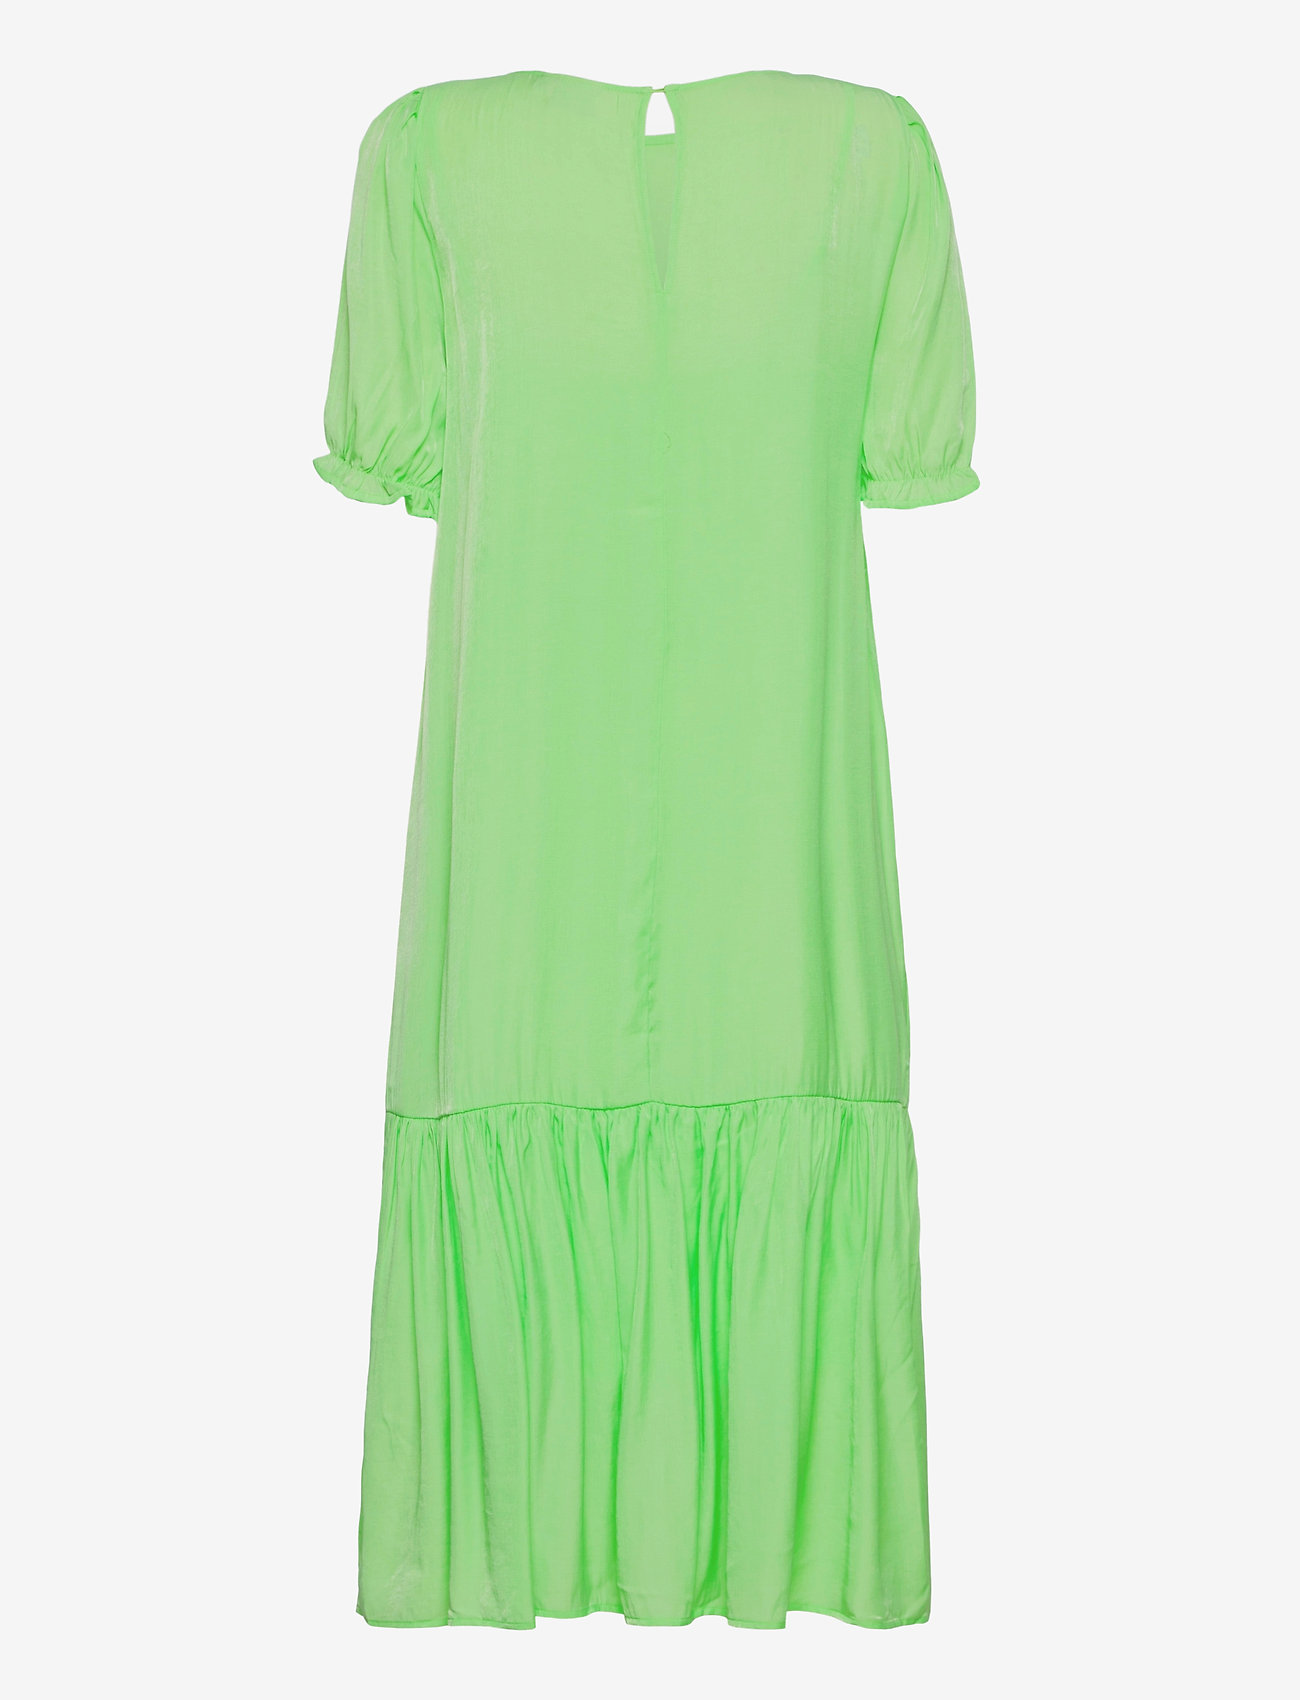 ICHI - IHEDINA DR - summer dresses - paradise green - 1